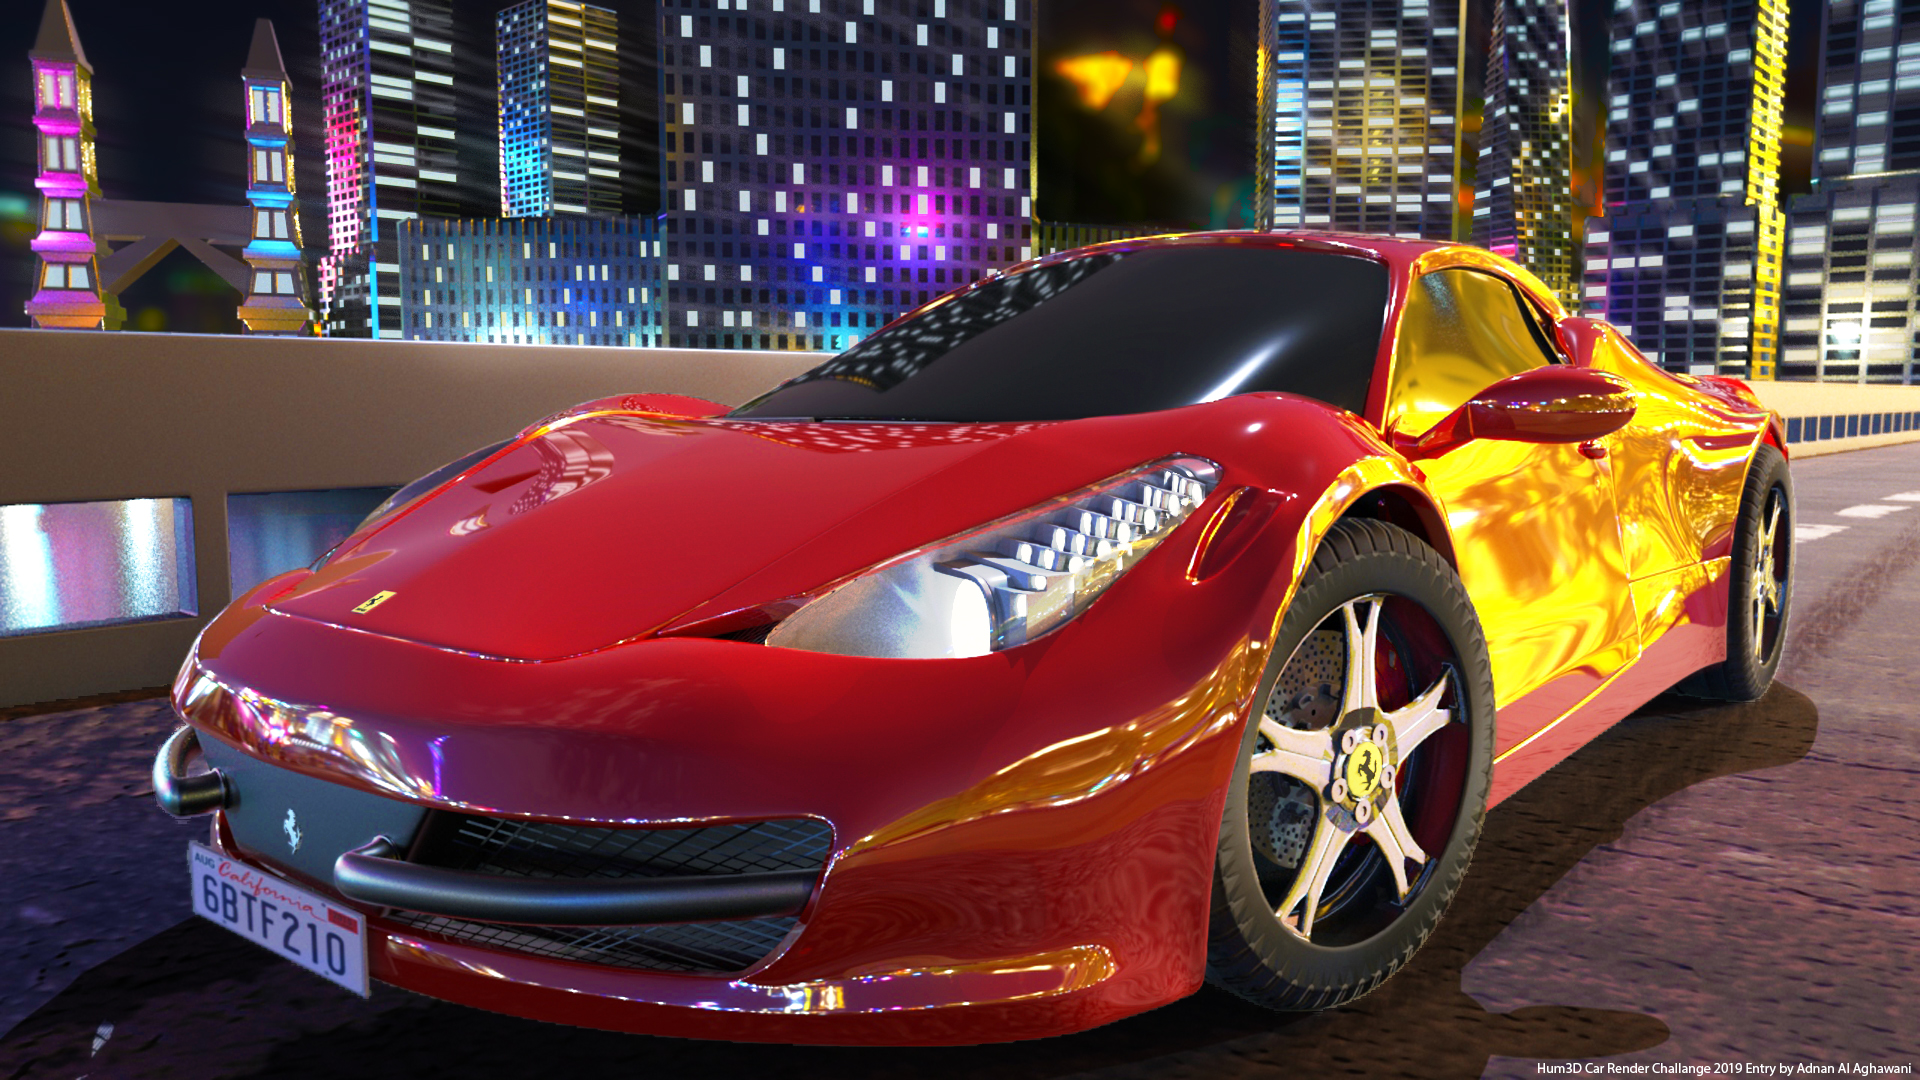 Driving Ferrari 458 italia 2013 in a modern city 3d art